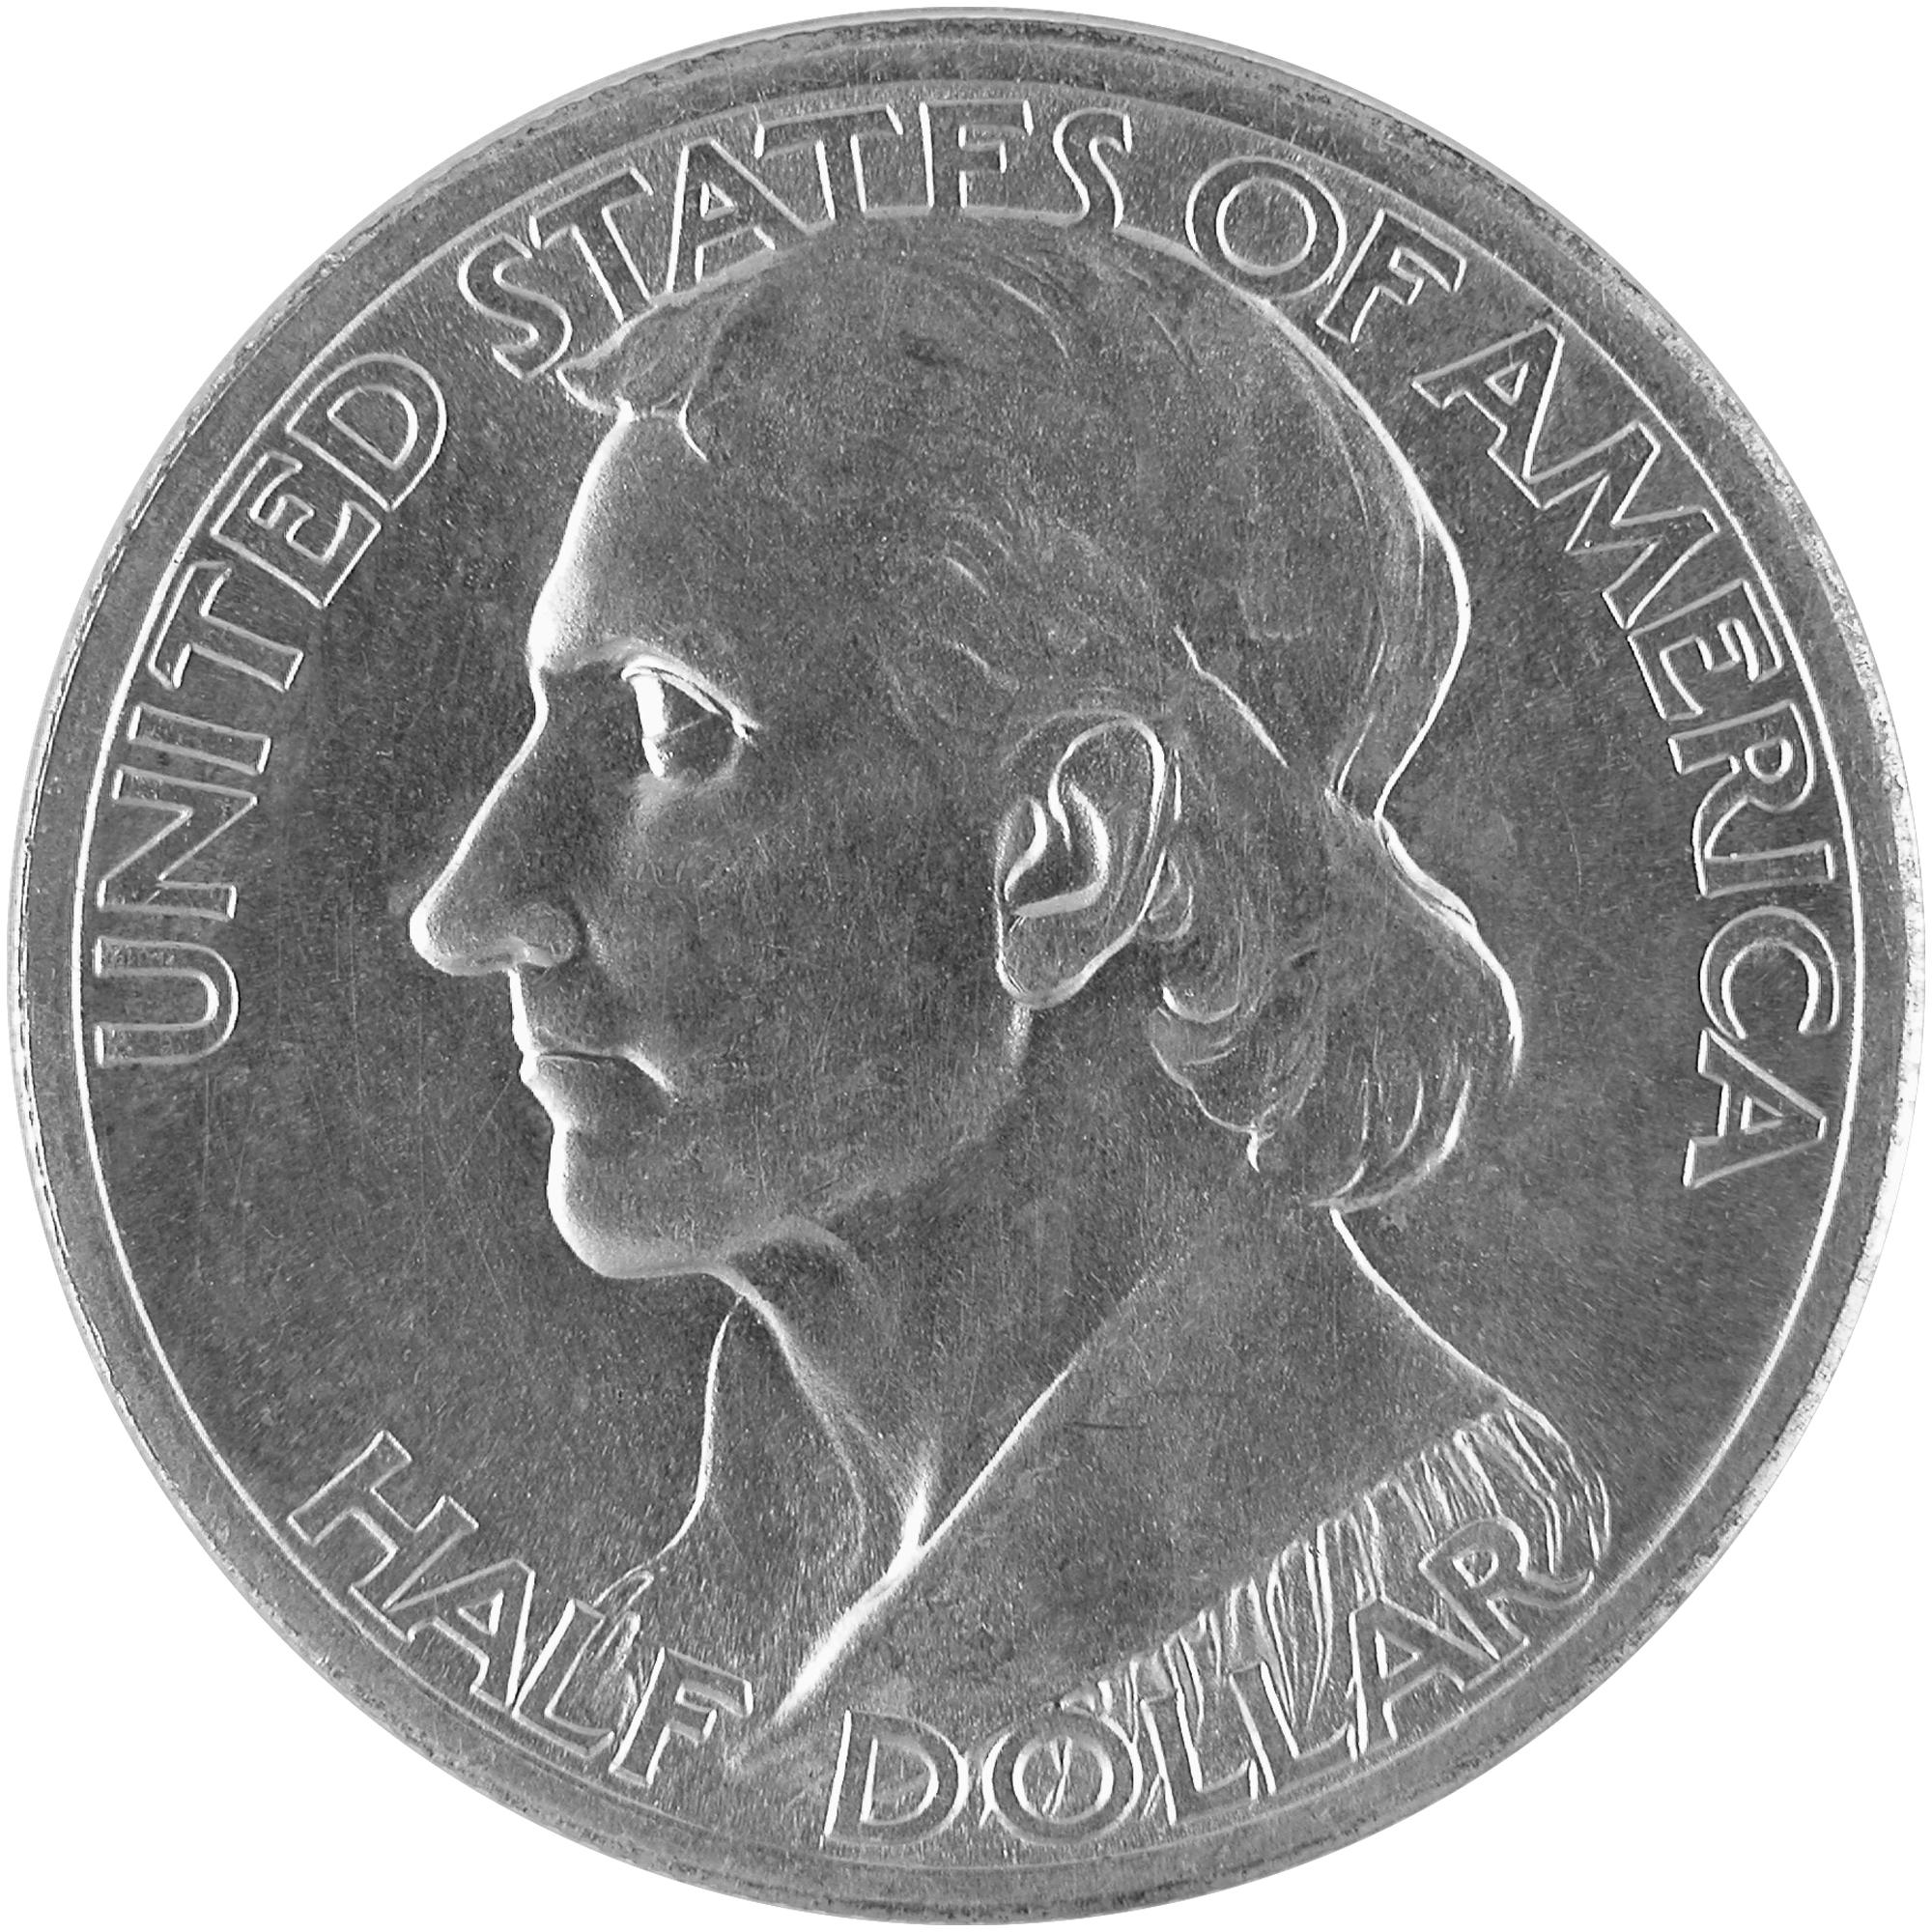 1934 Daniel Boone Bicentennial Commemorative Silver Half Dollar Coin Obverse